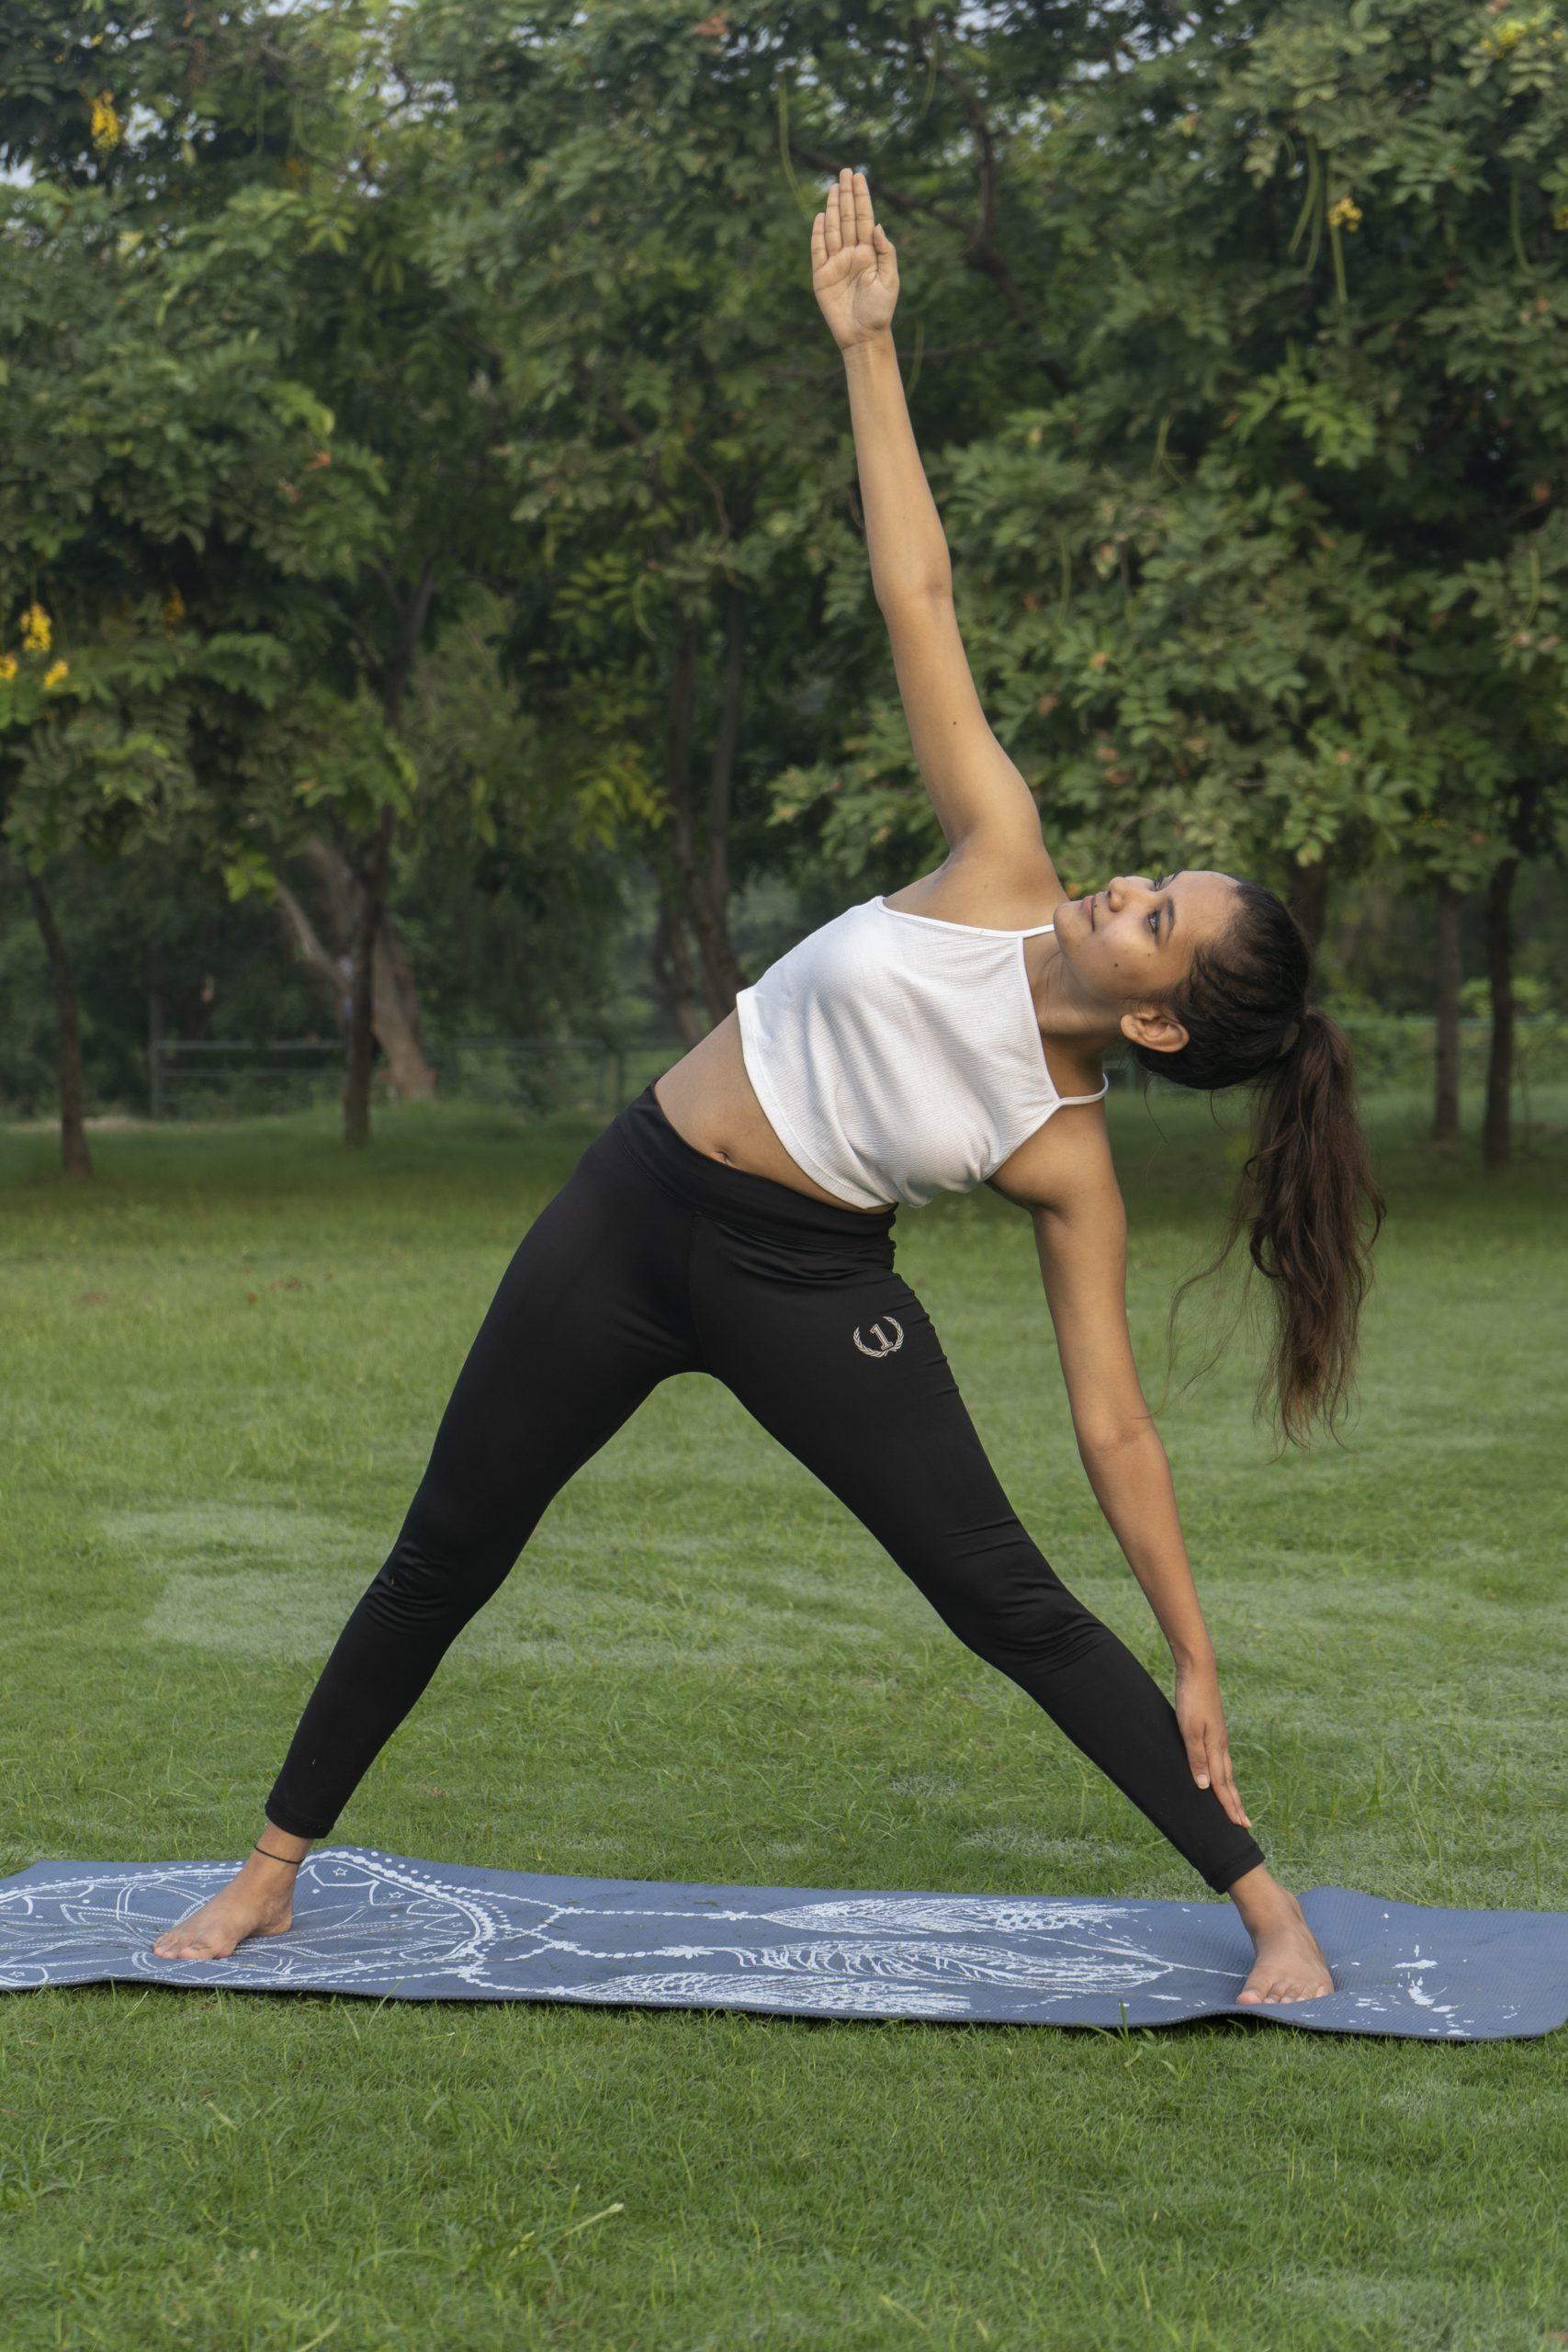 Girl Doing Triangle Pose in Yoga